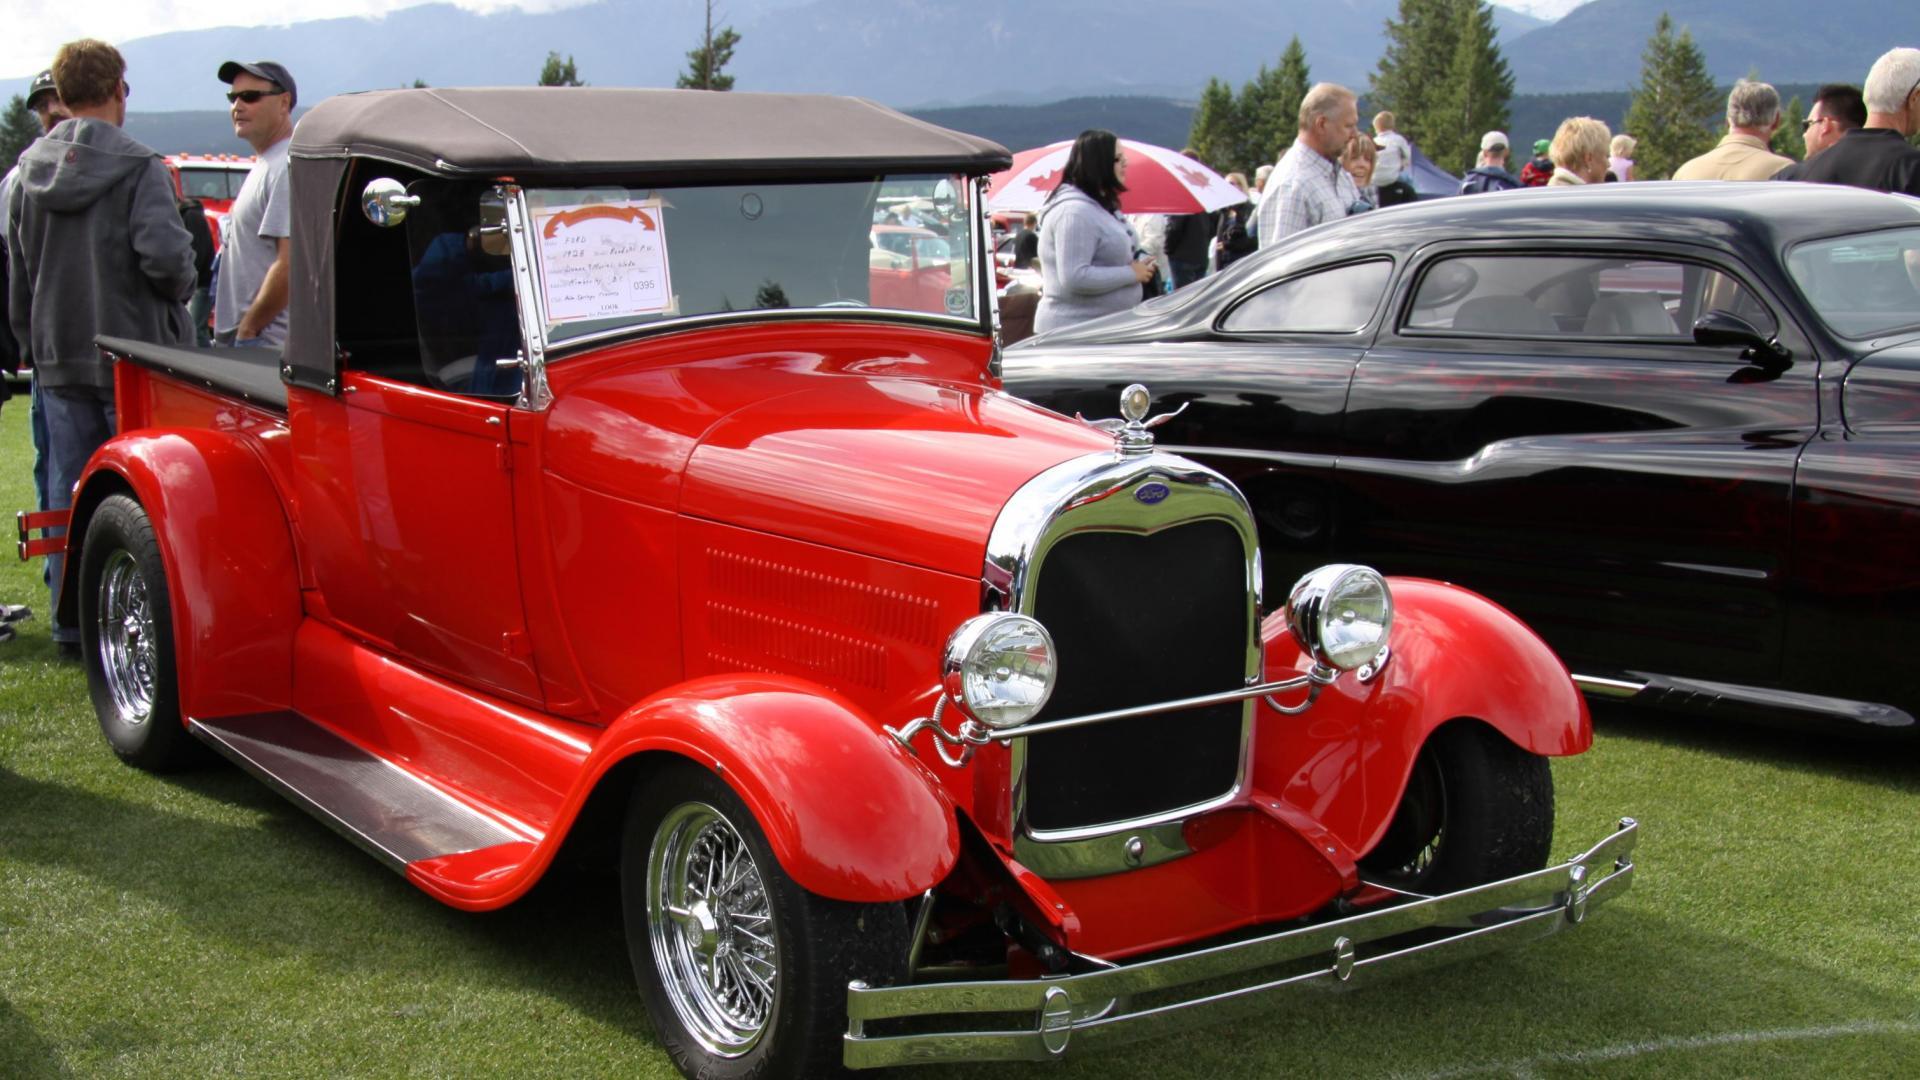 Ford 1928 in Radium Hot Springs car show 28     42080 HD Wallpaper